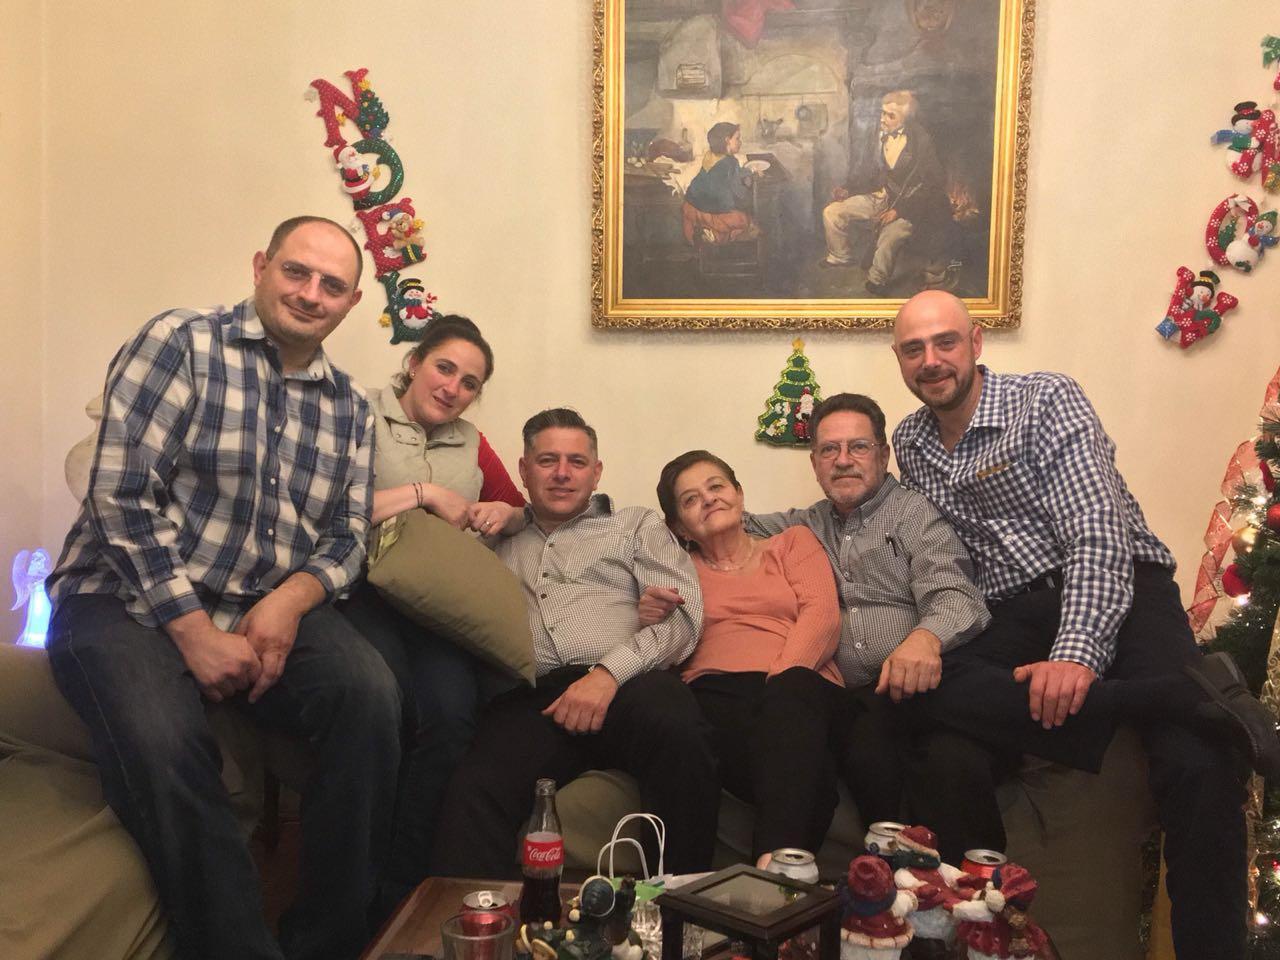 La familia reunida en navidad for Familia roca